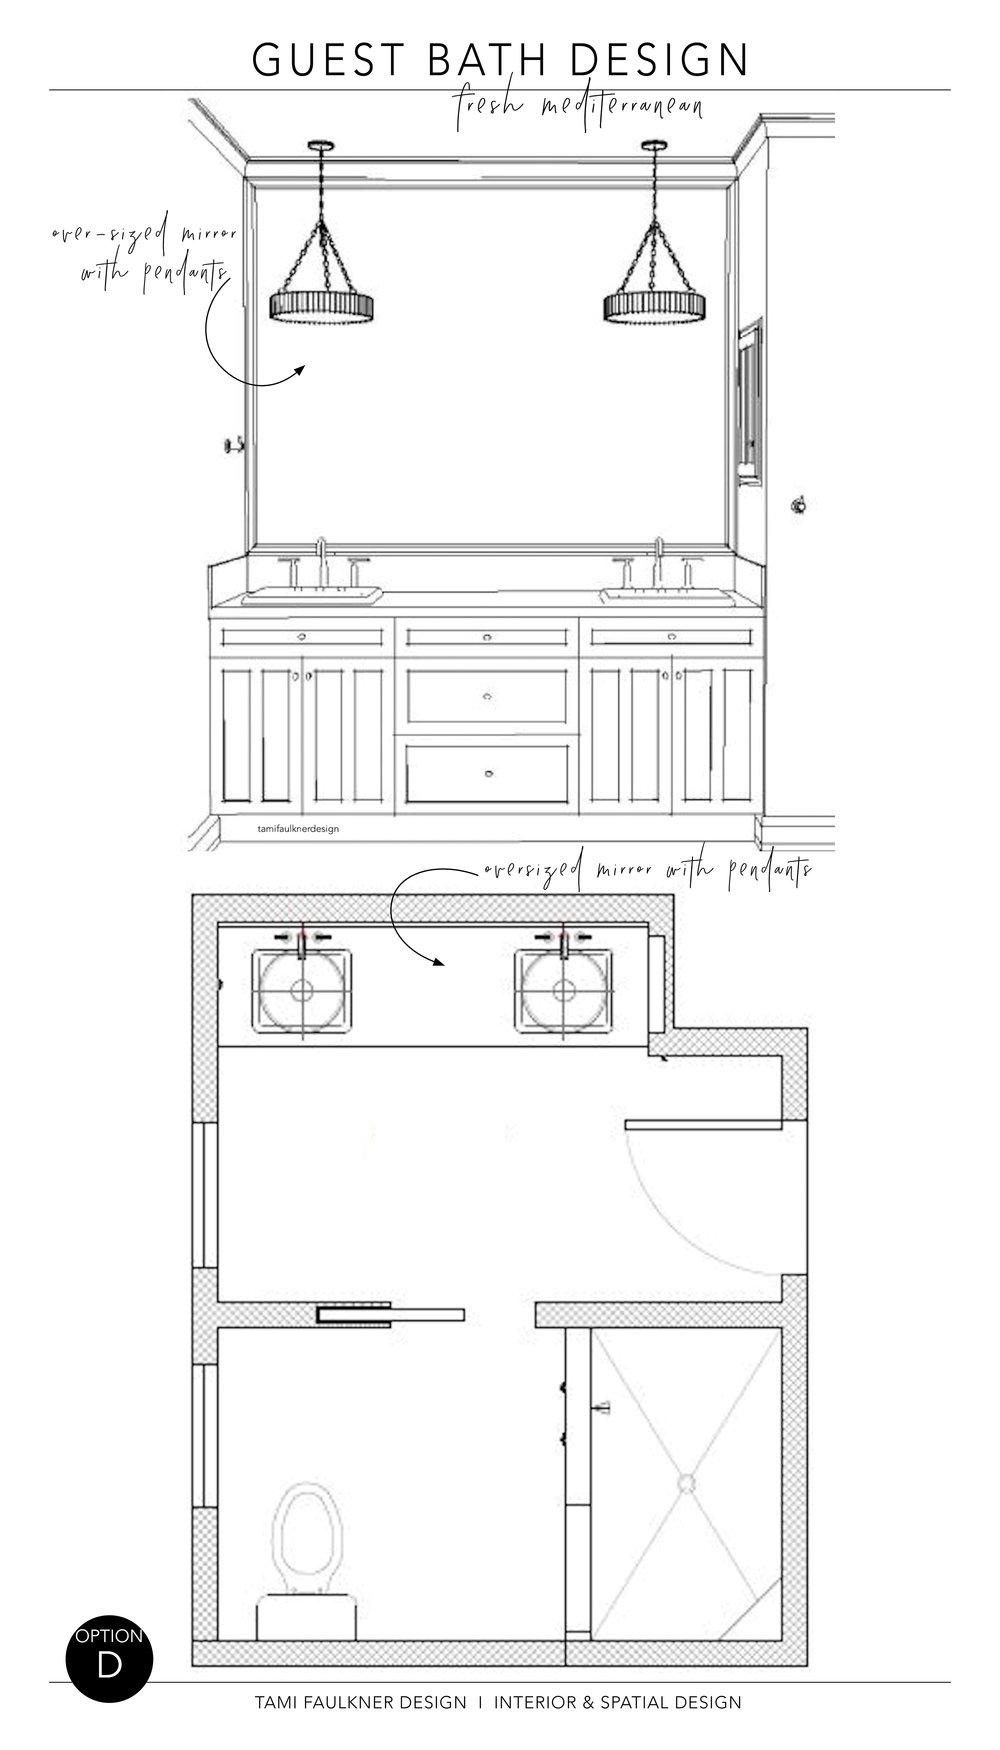 BATHROOM MAKE-OVER AT PROJECT GATE HILL — White Pencil No. 2